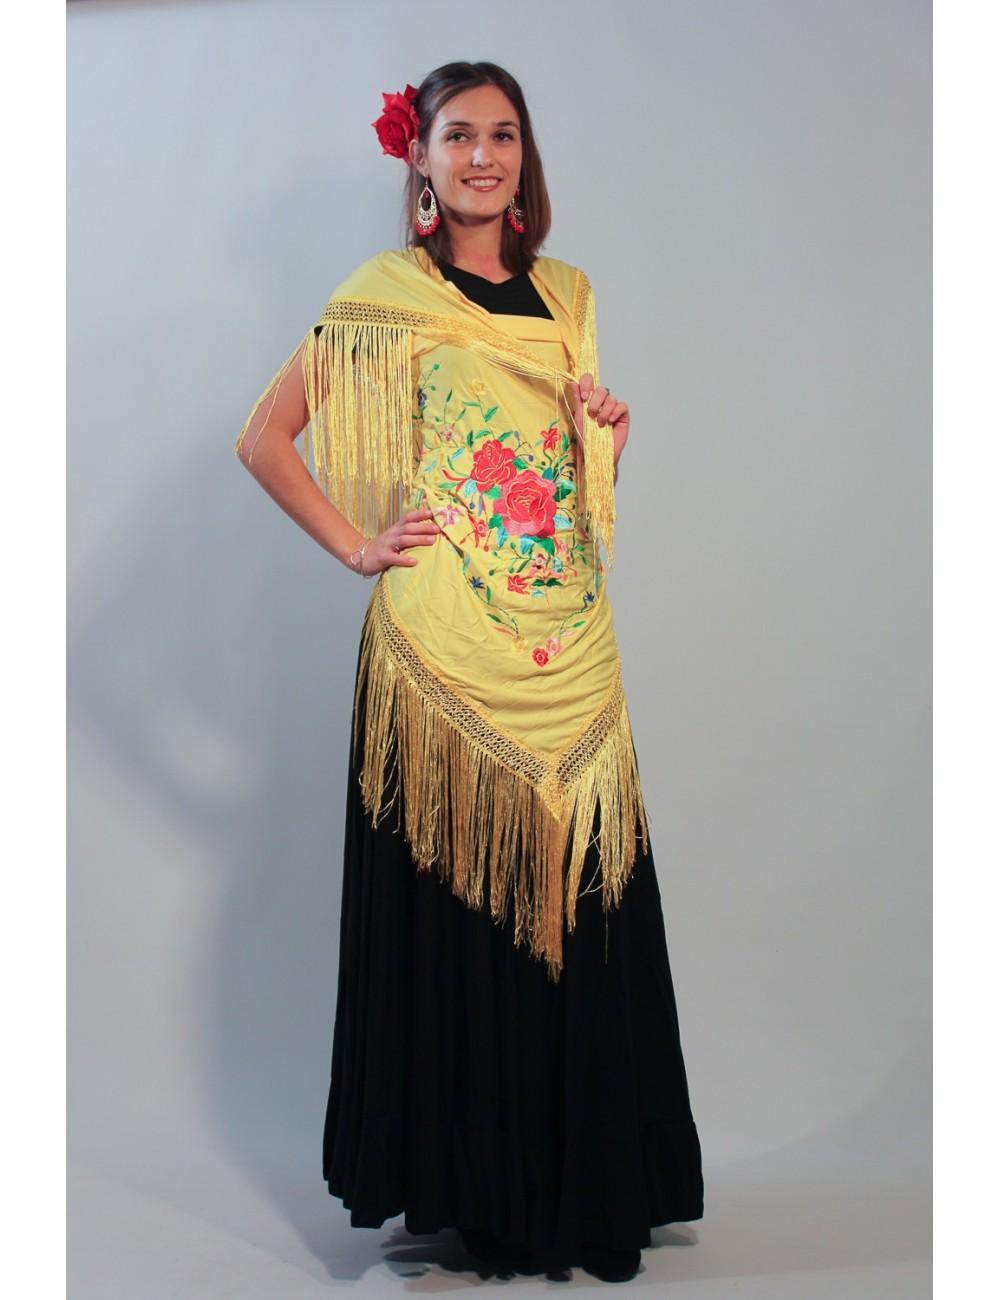 Grand châle flamenco jaune brodé multicolor